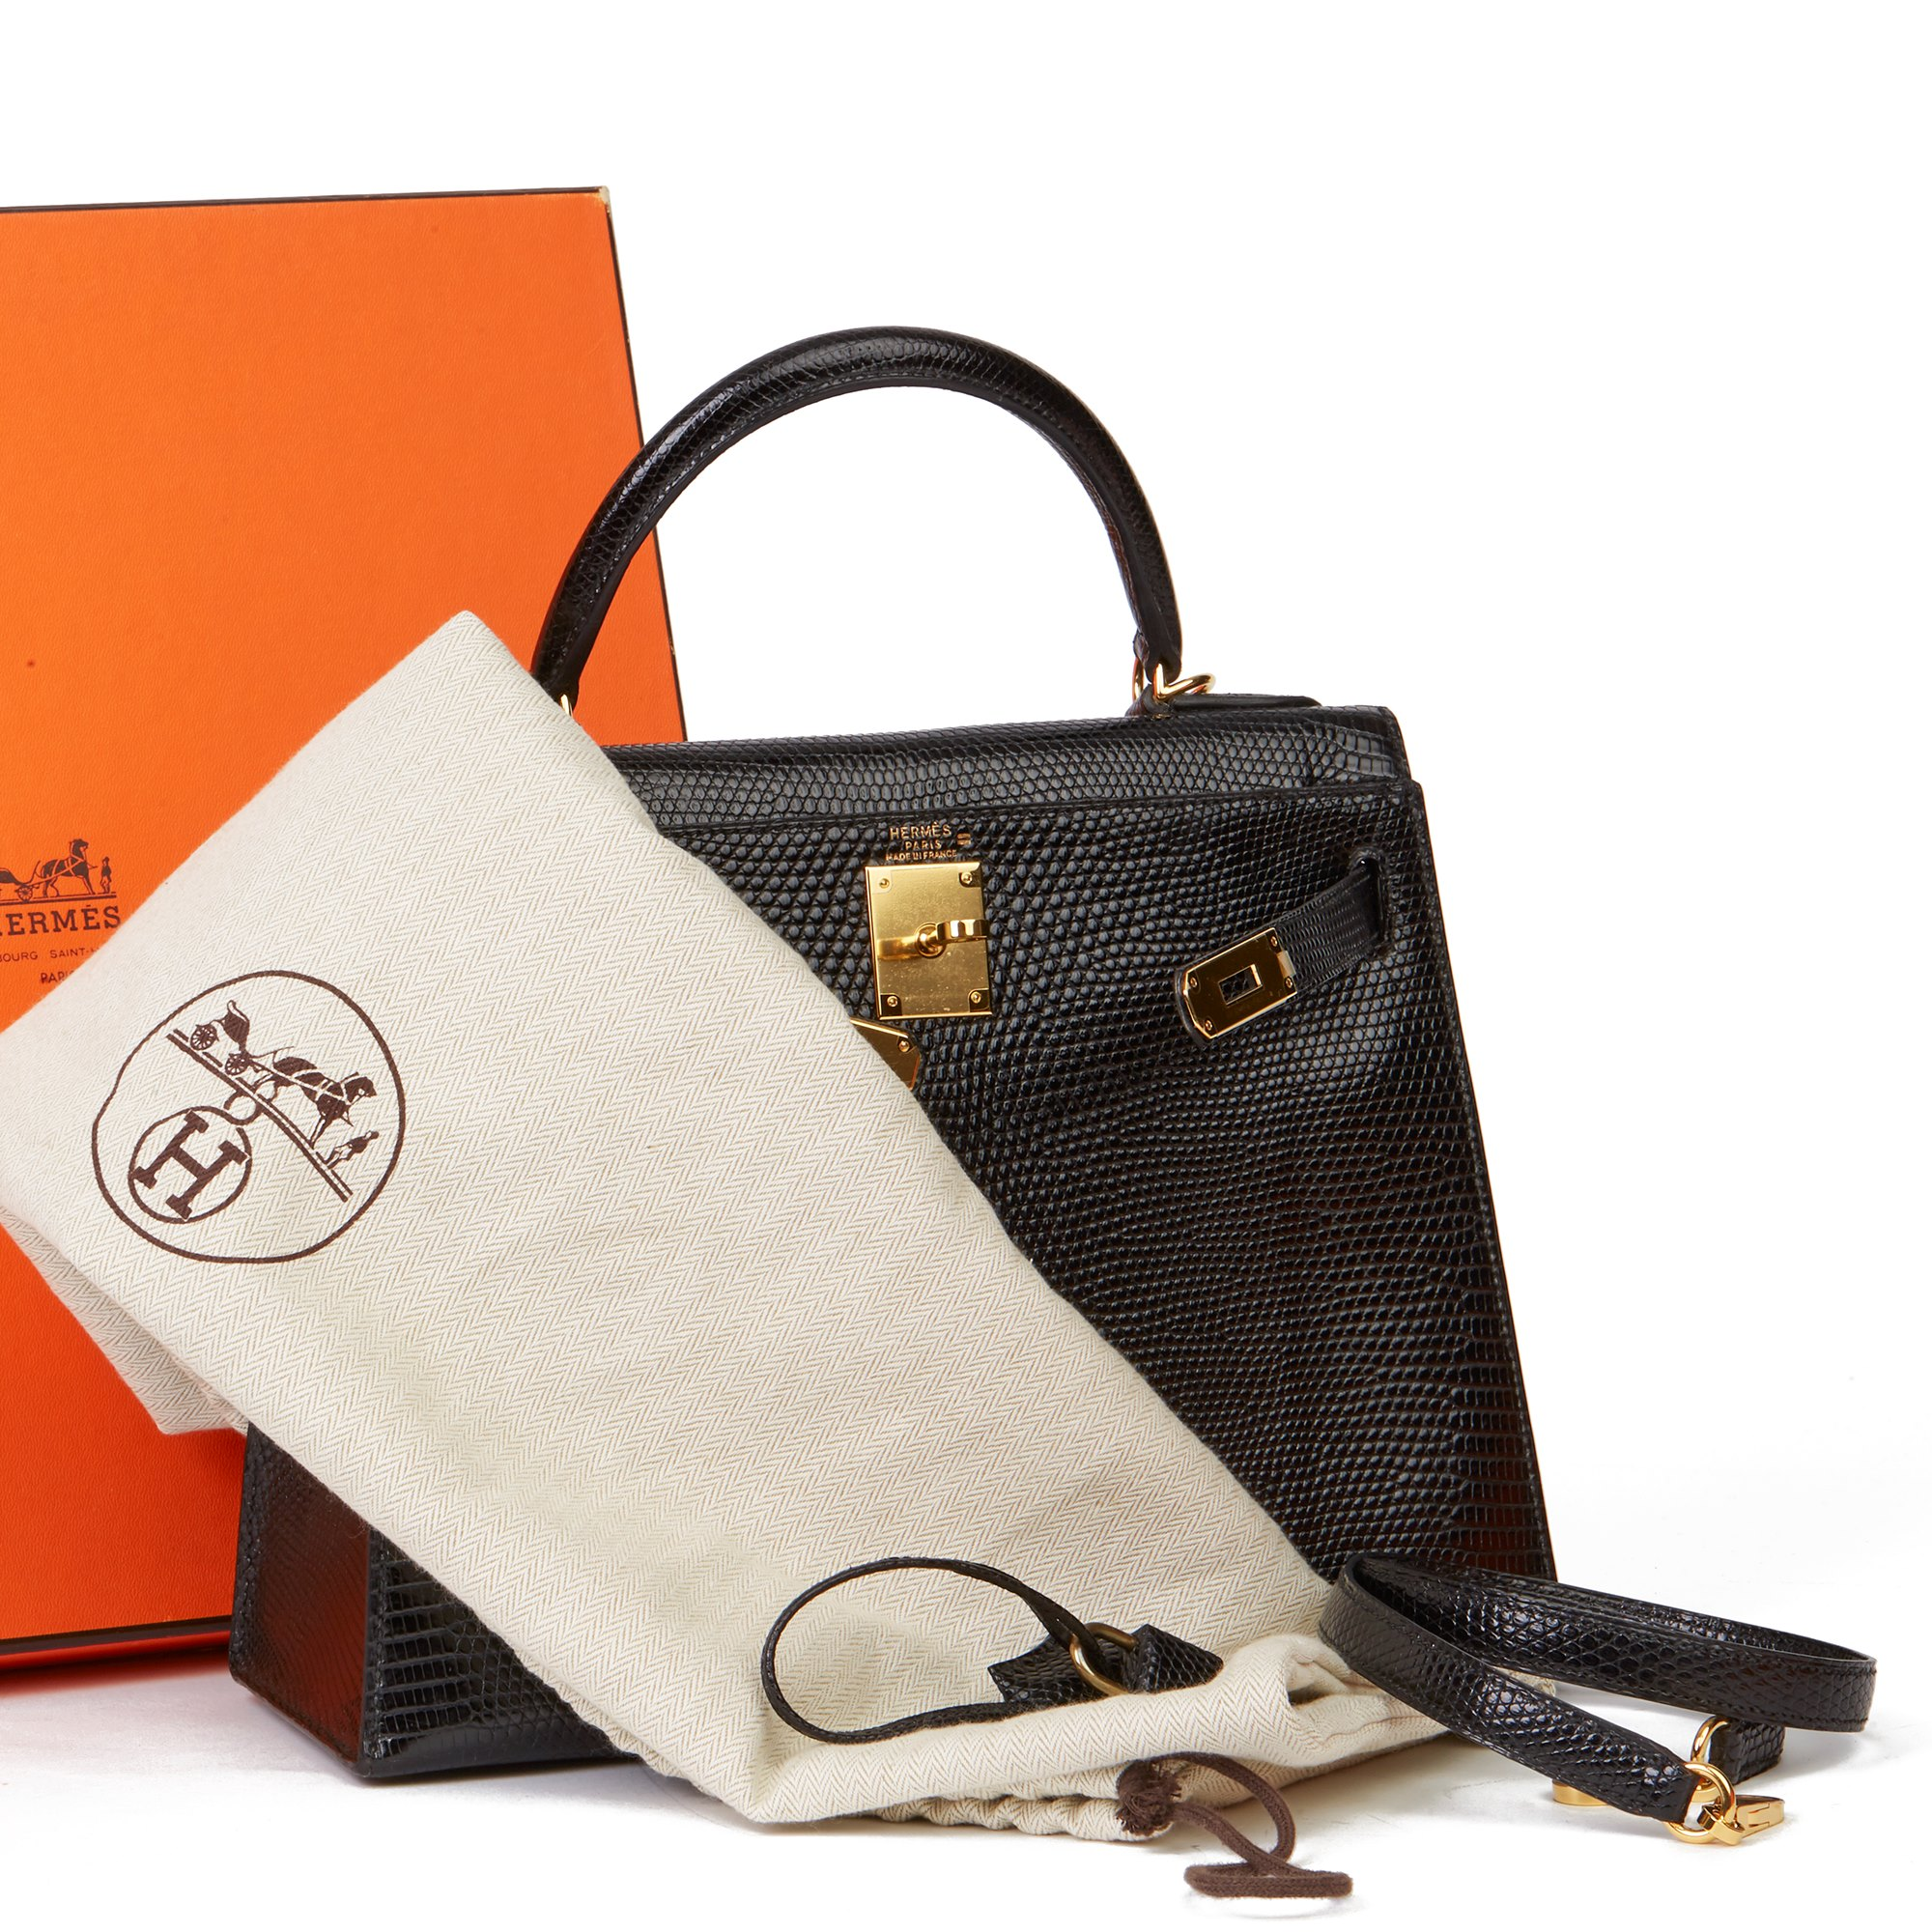 Hermès Black Lizard Leather Vintage Kelly 28cm Sellier